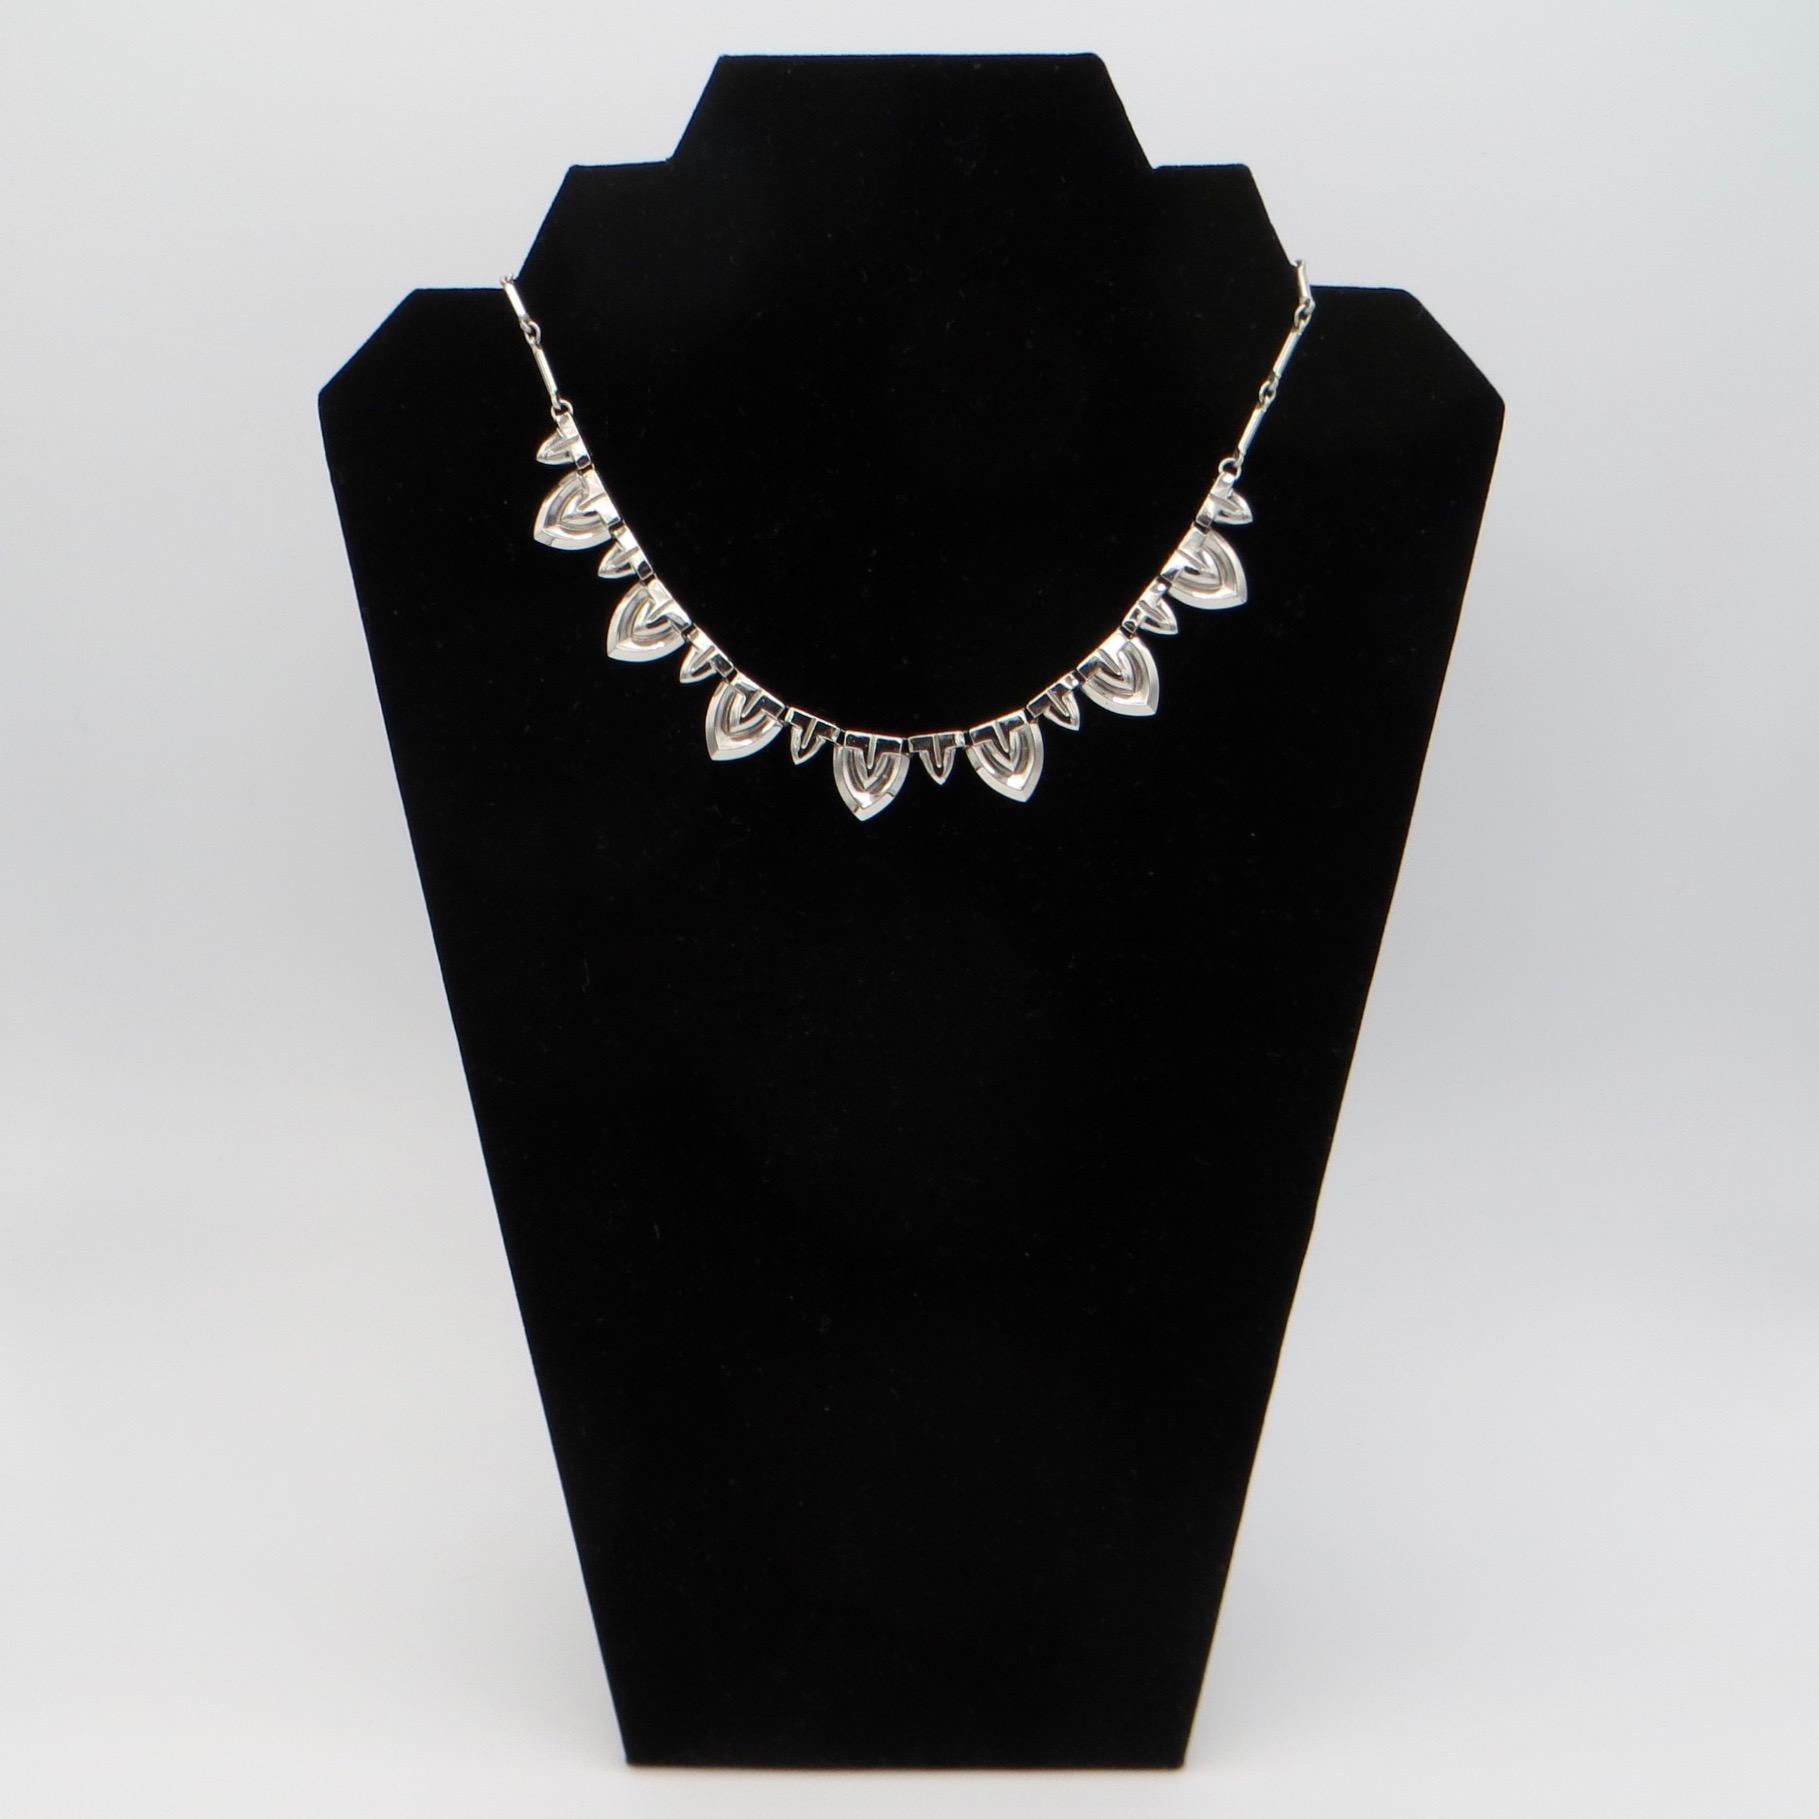 1940s Chrome Necklace